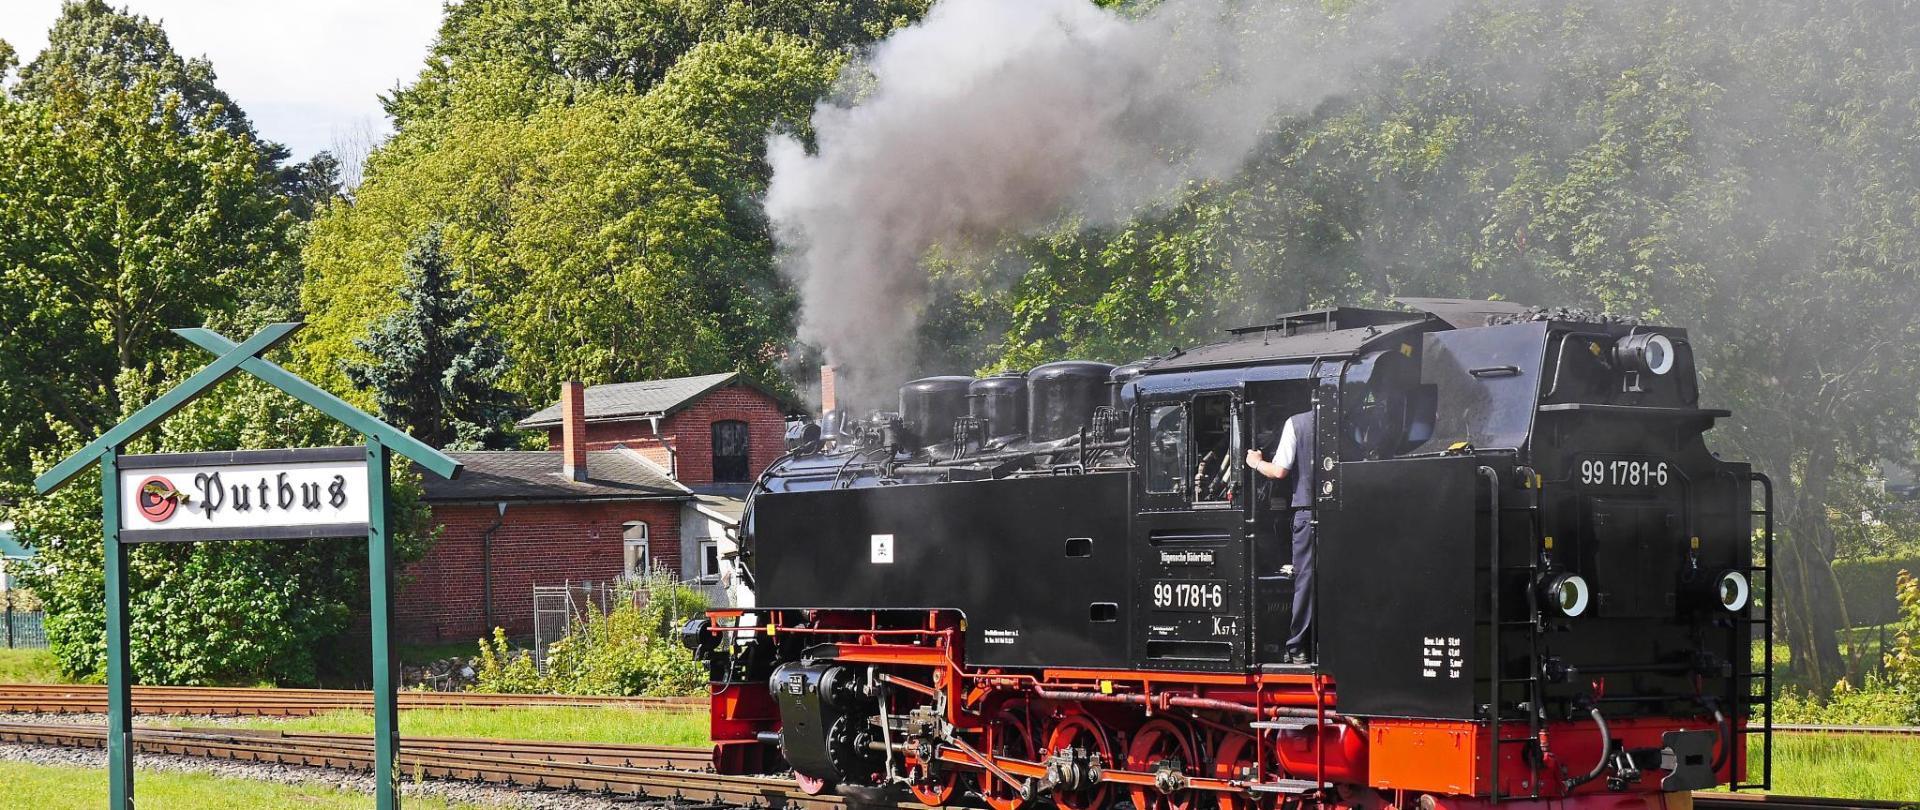 steam-locomotive-2947932.jpg